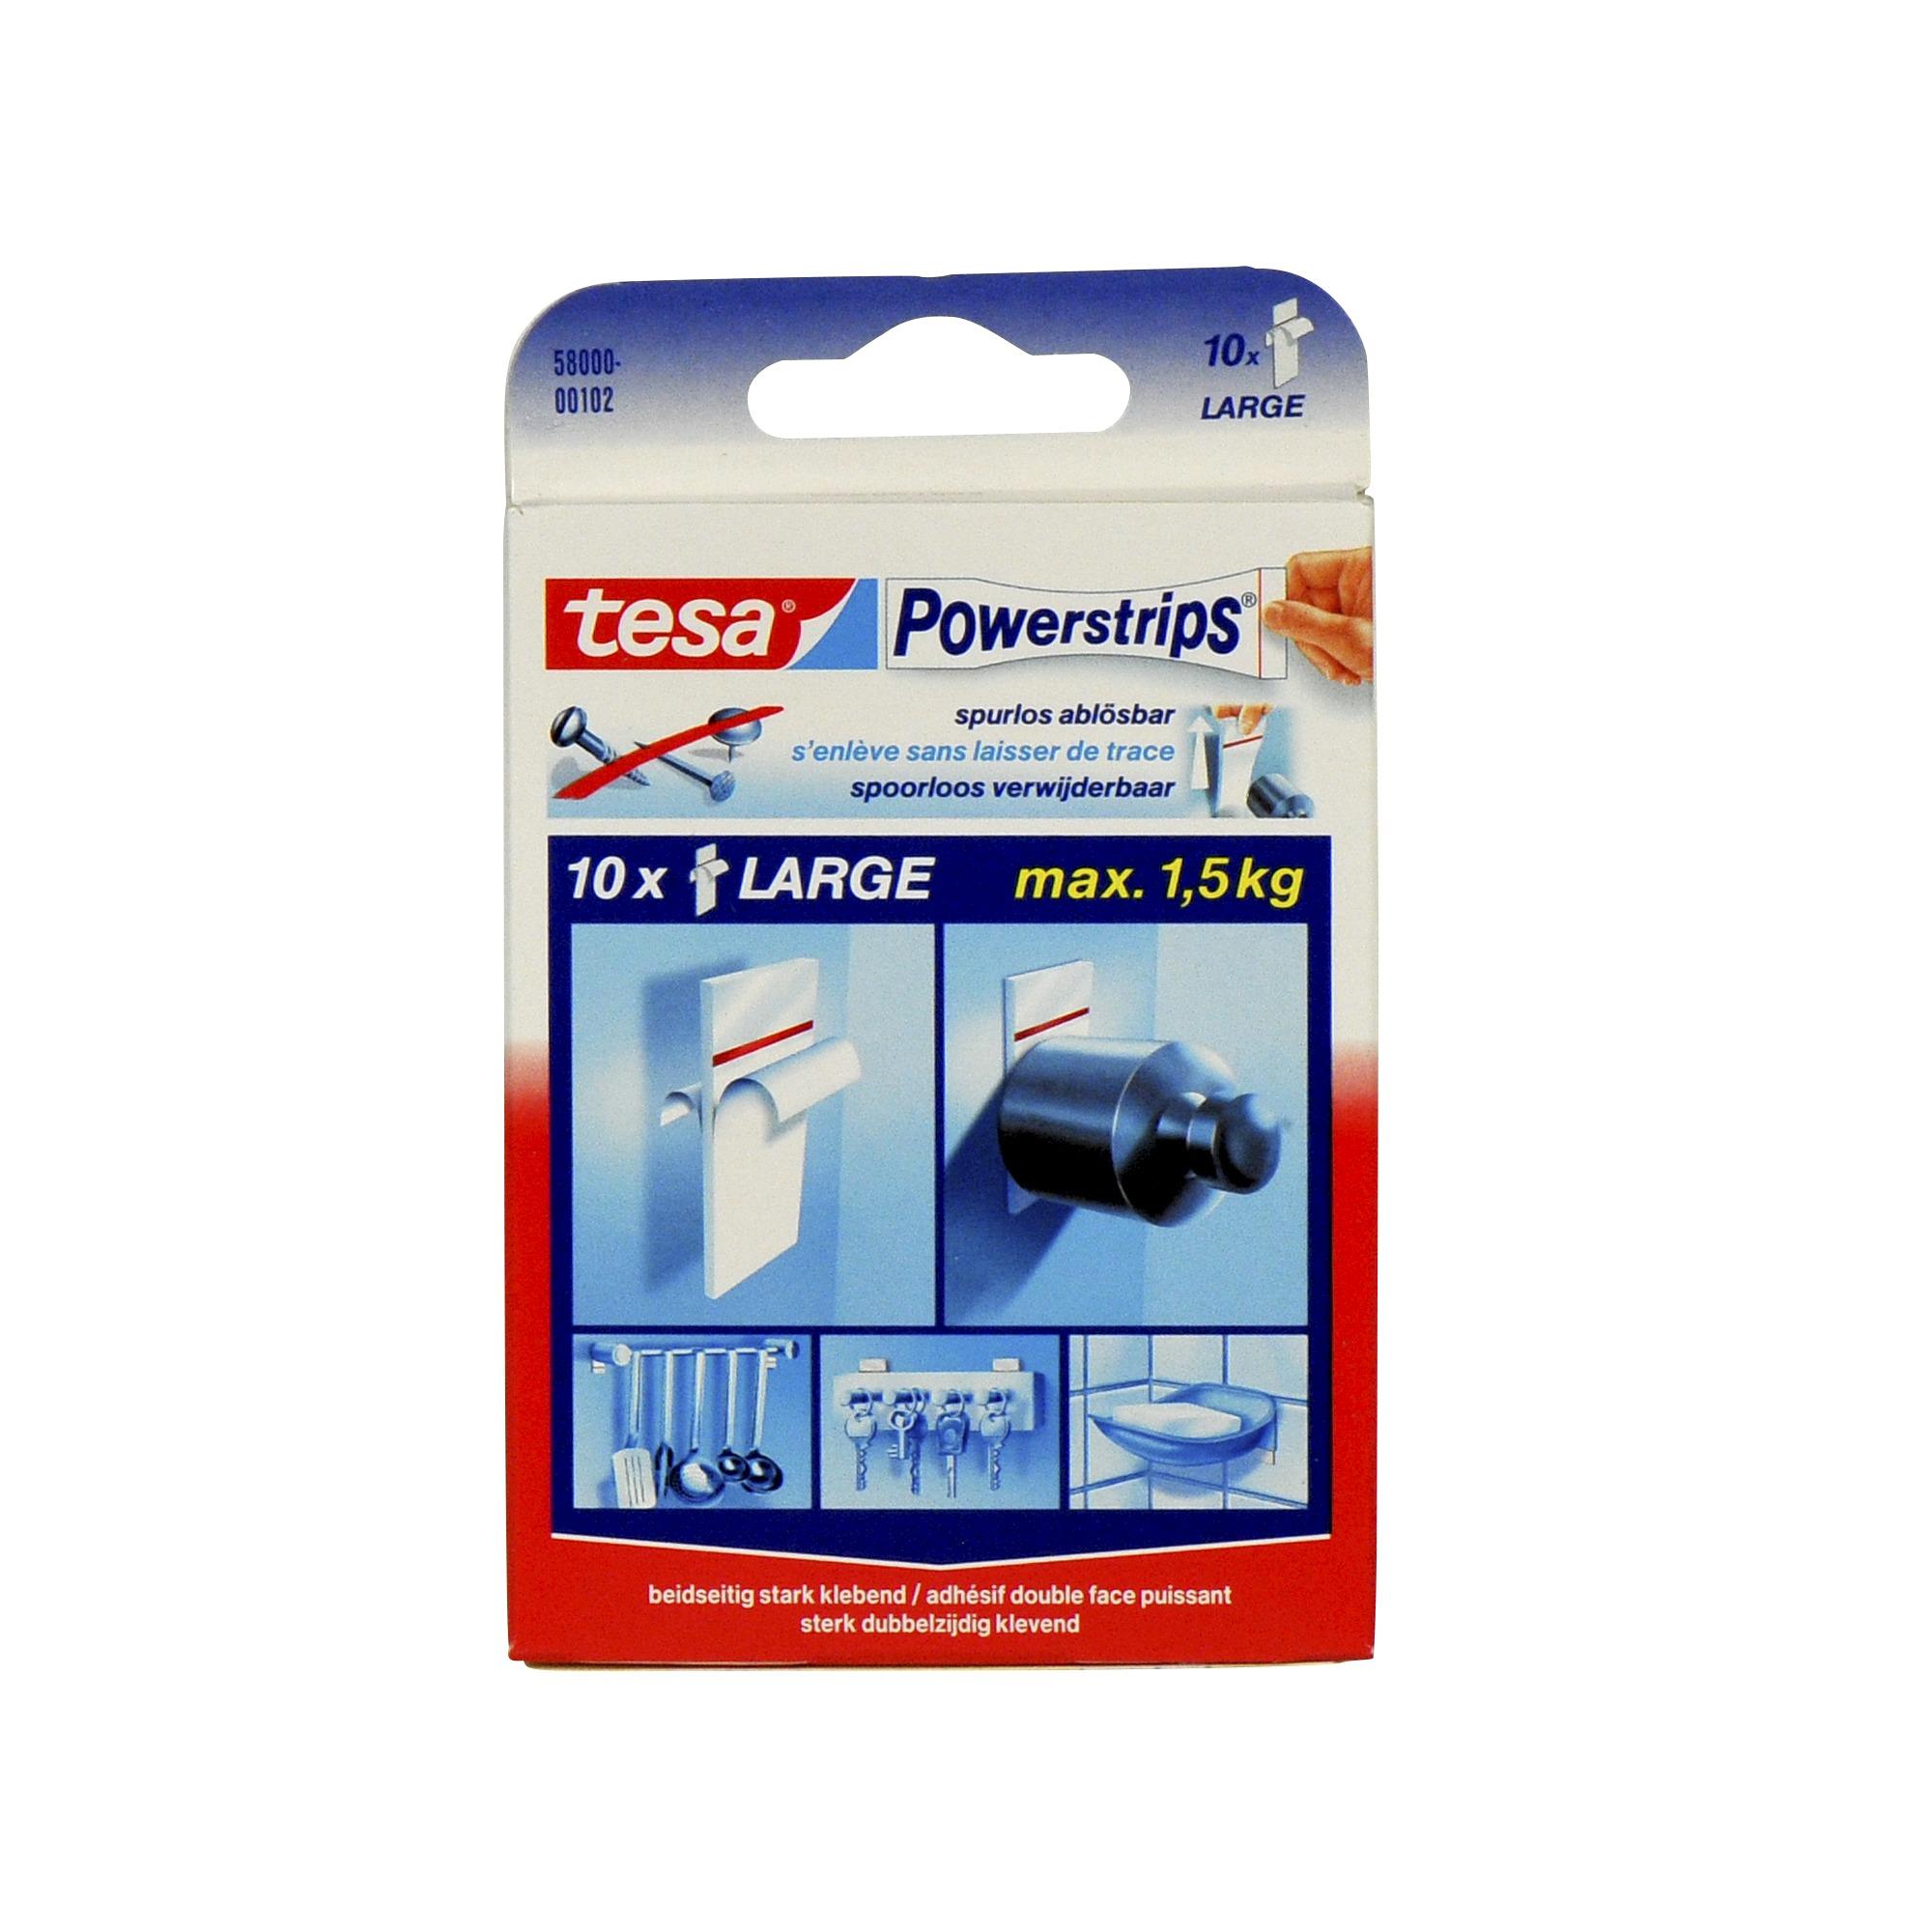 tesa powerstrips strips large wit 10 st badkameraccessoires toiletaccessoires. Black Bedroom Furniture Sets. Home Design Ideas